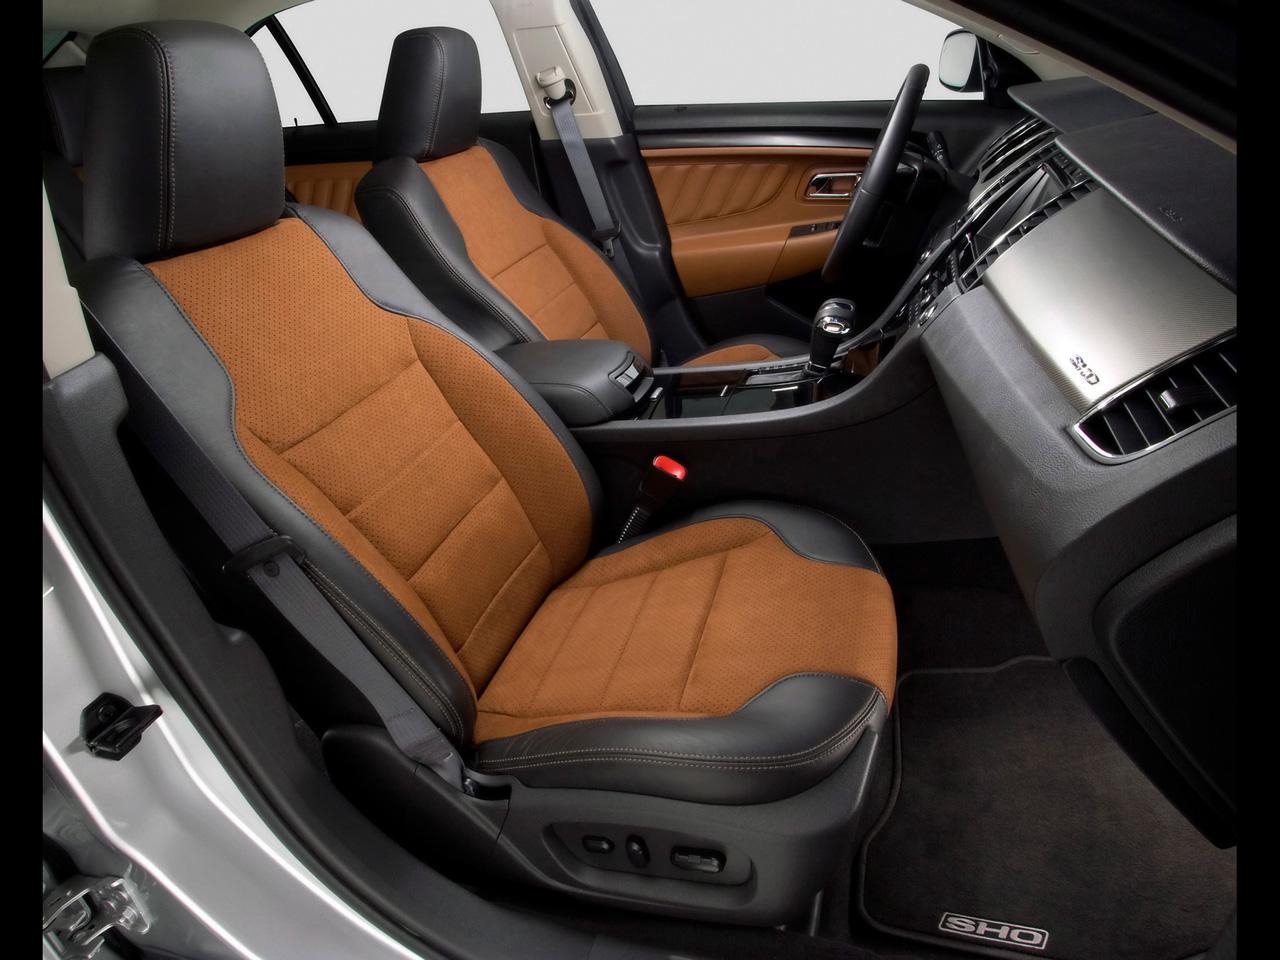 Name 2010 ford taurus sho interior 1280x960 jpg views